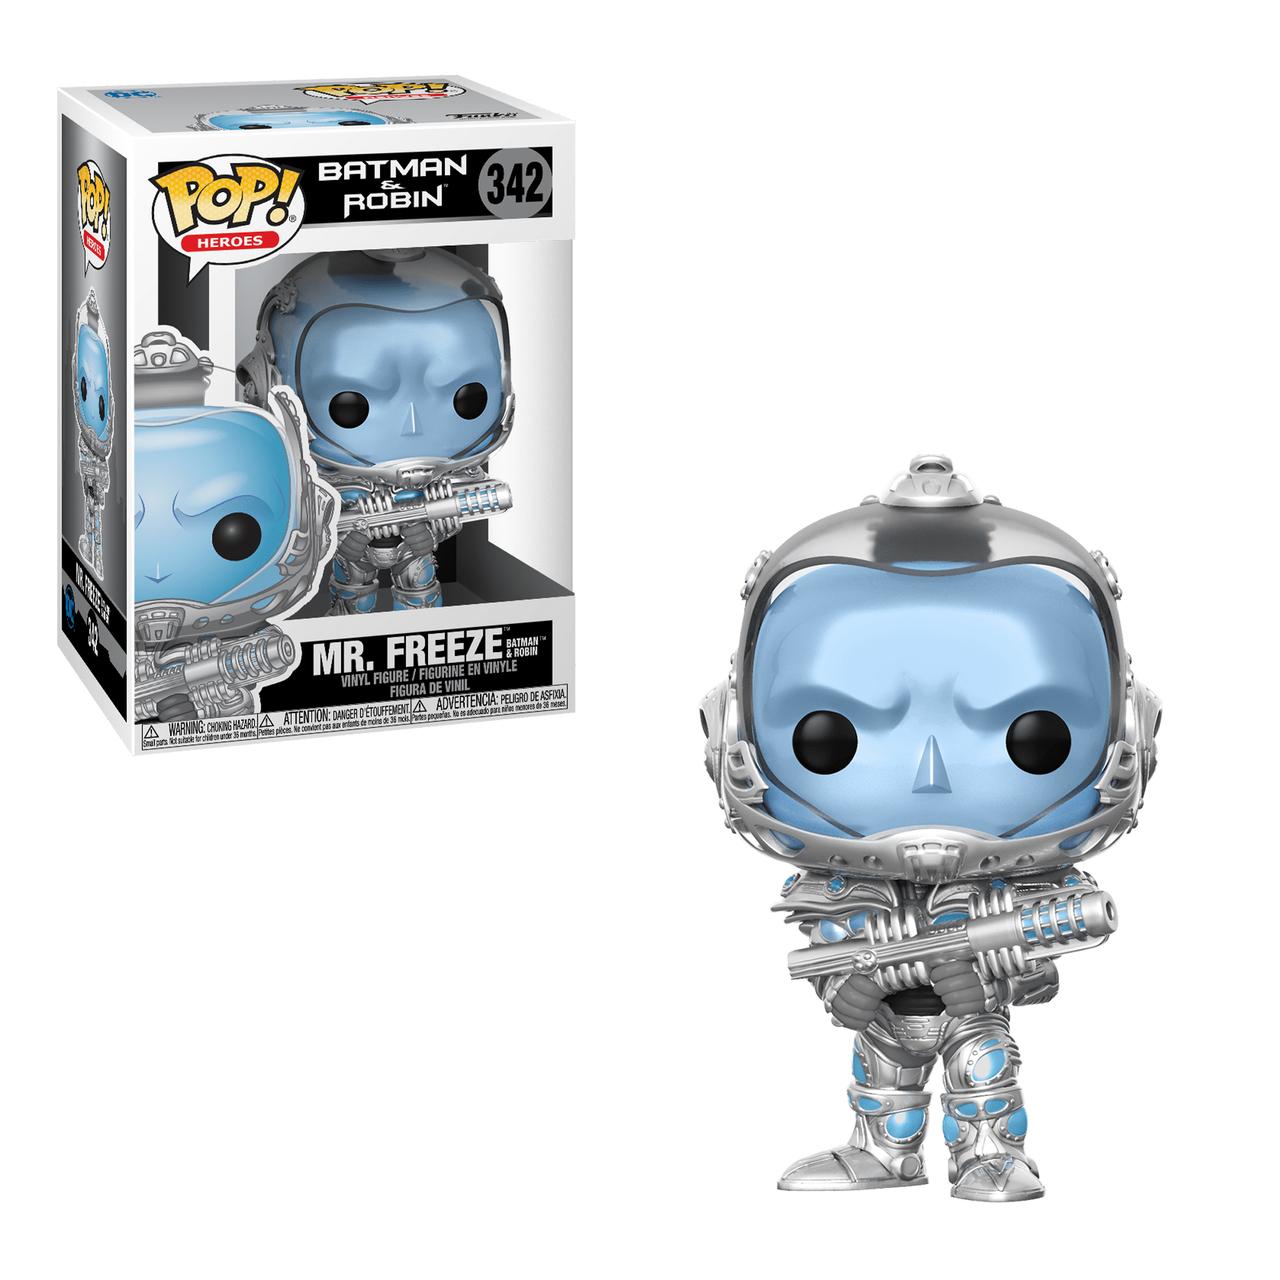 Funko POP! Heroes Batman & Robin Mr. Freeze #342